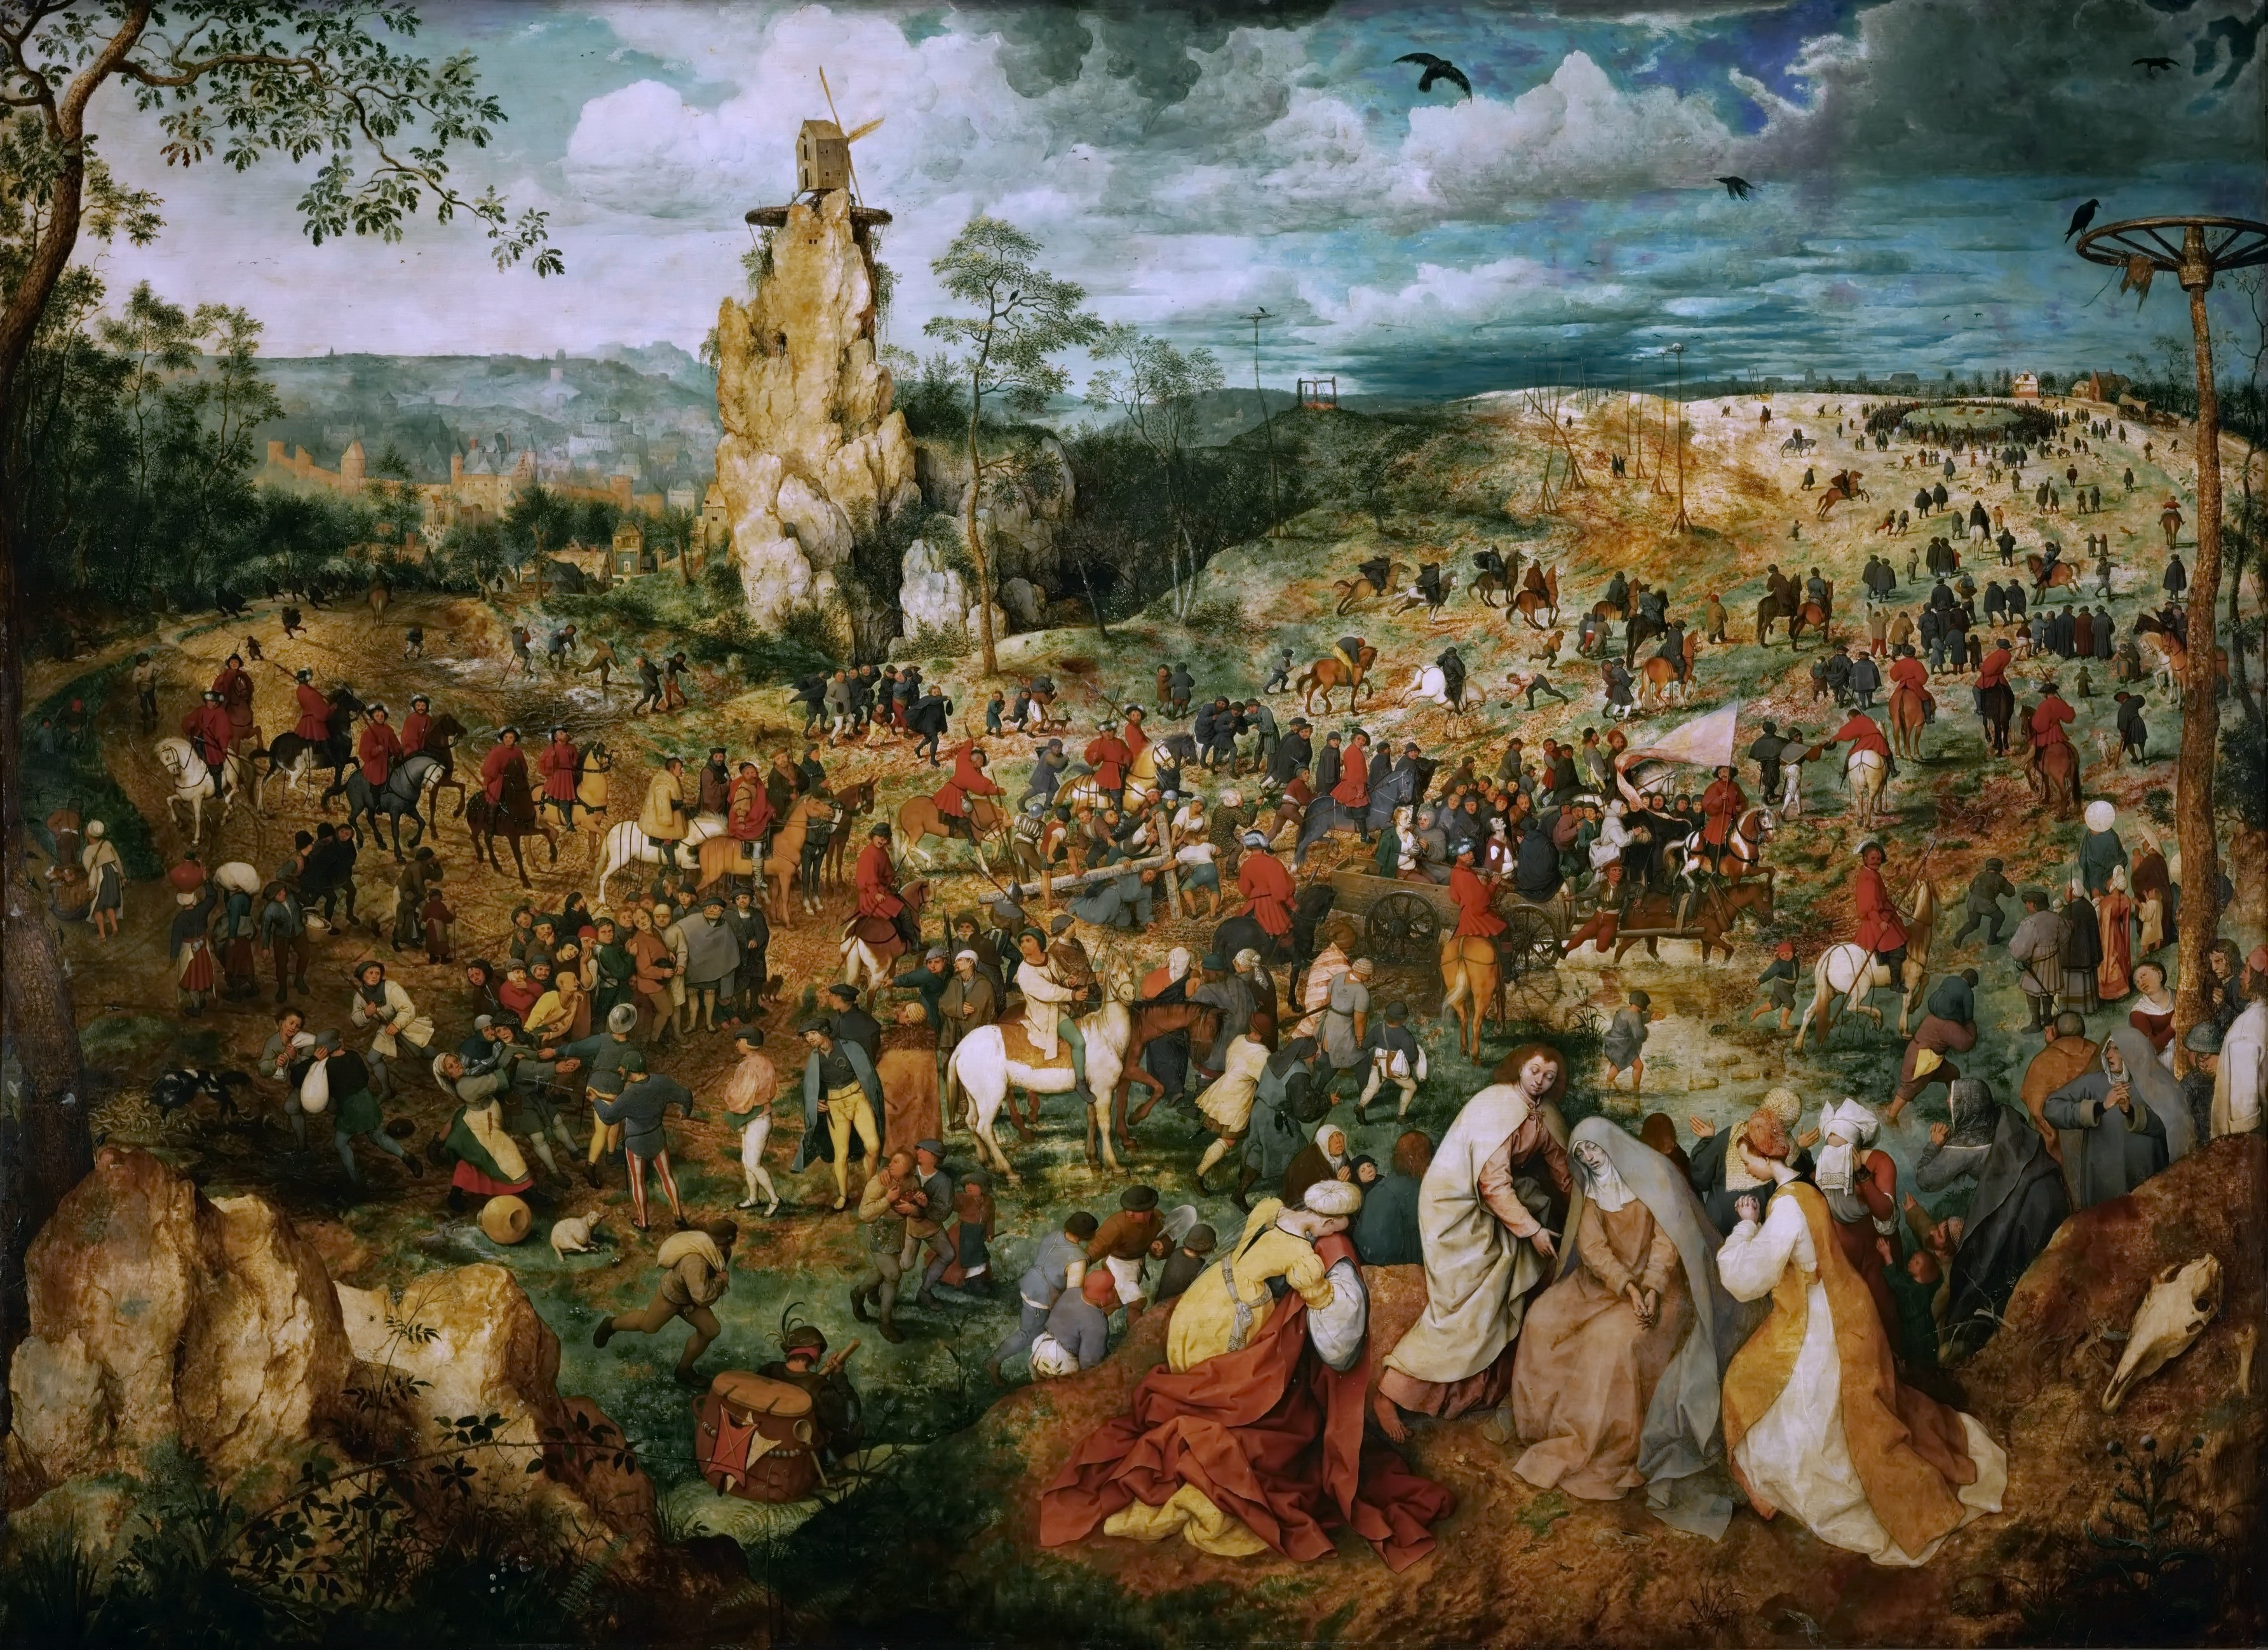 File:Pieter Bruegel (I) - The Procession to Calvary (1564).